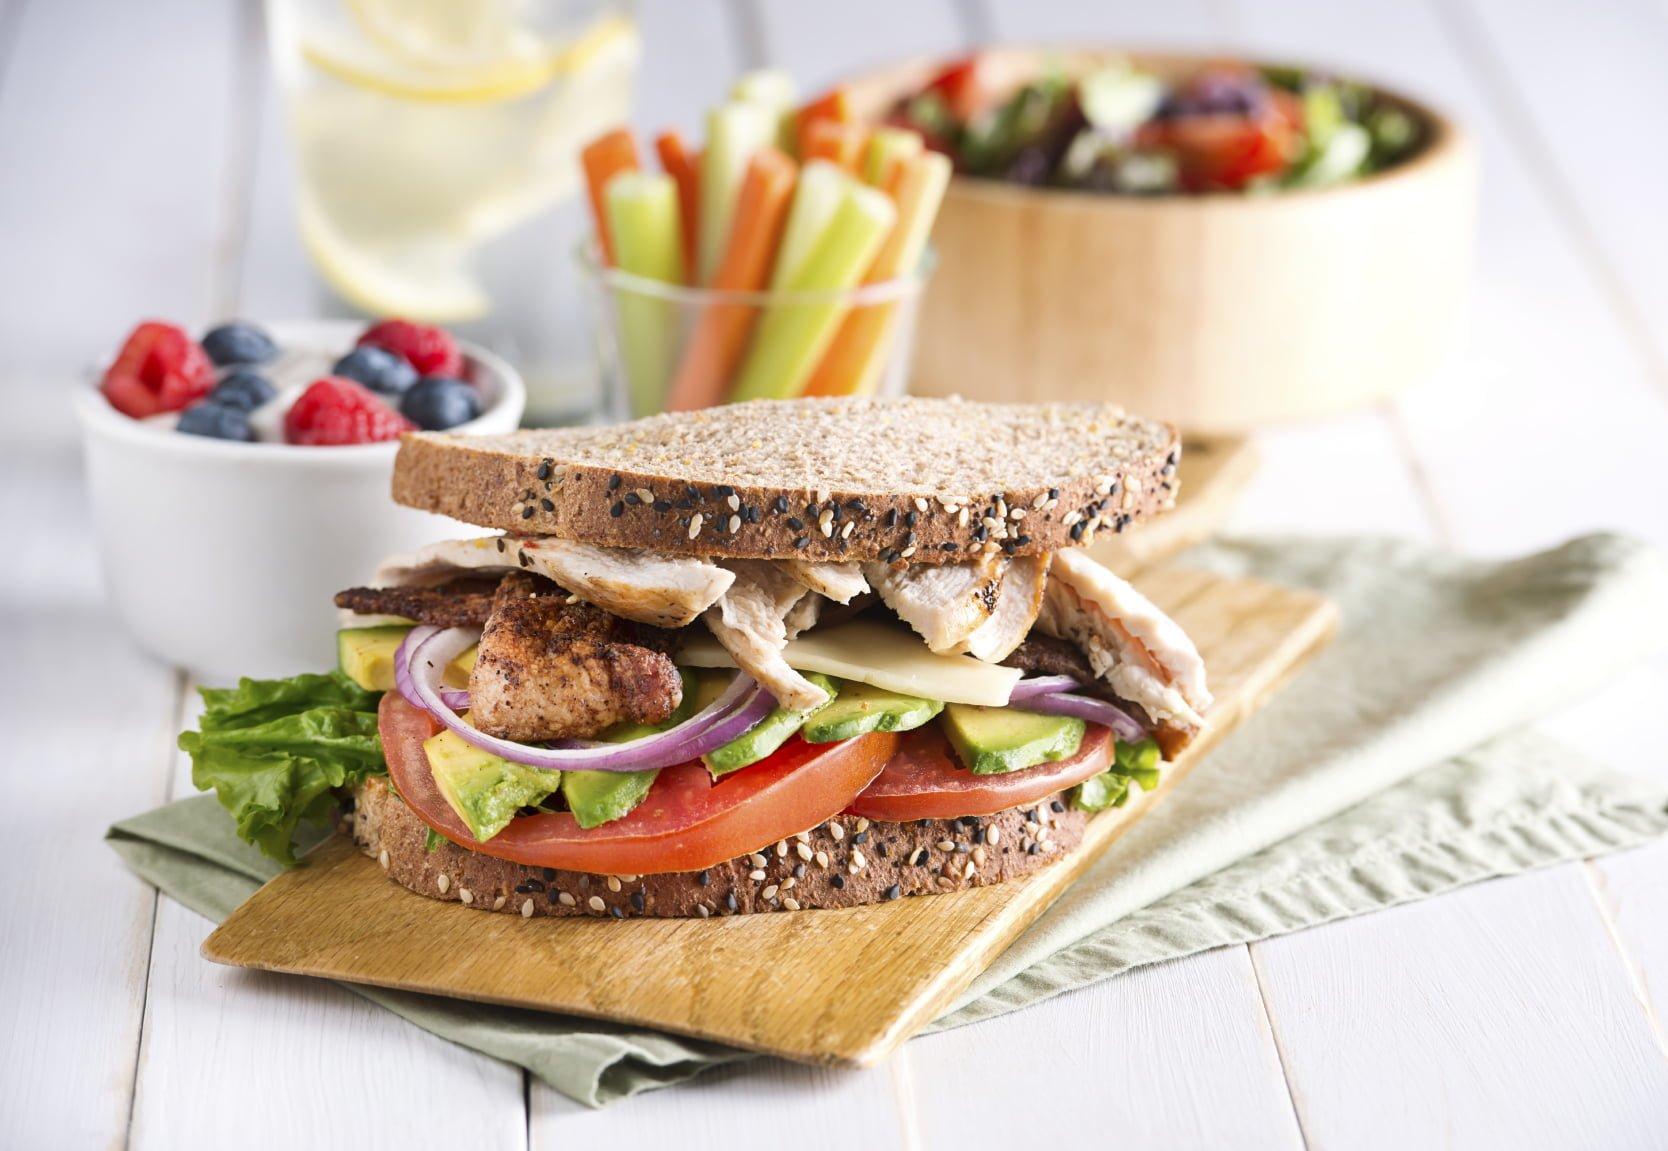 sandwich, veggies and fruit yoghurt